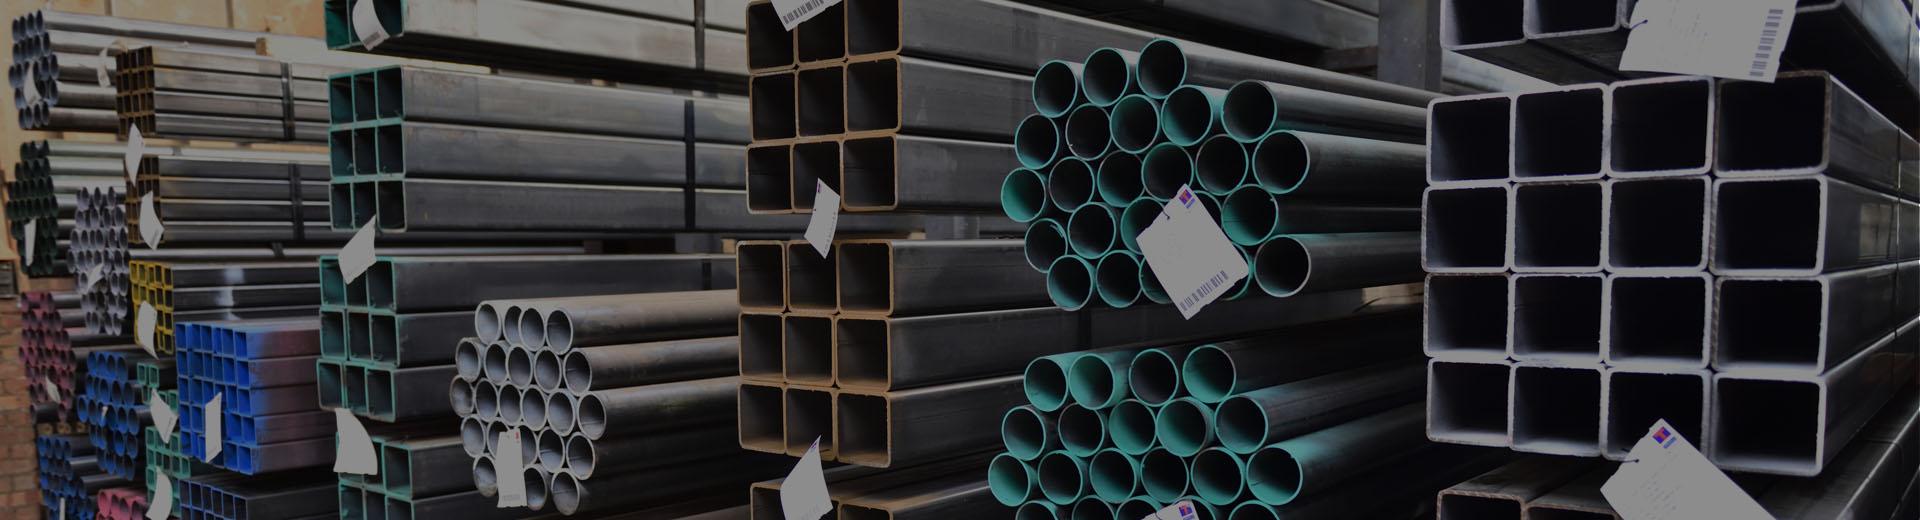 ERW Circular Steel Tubes